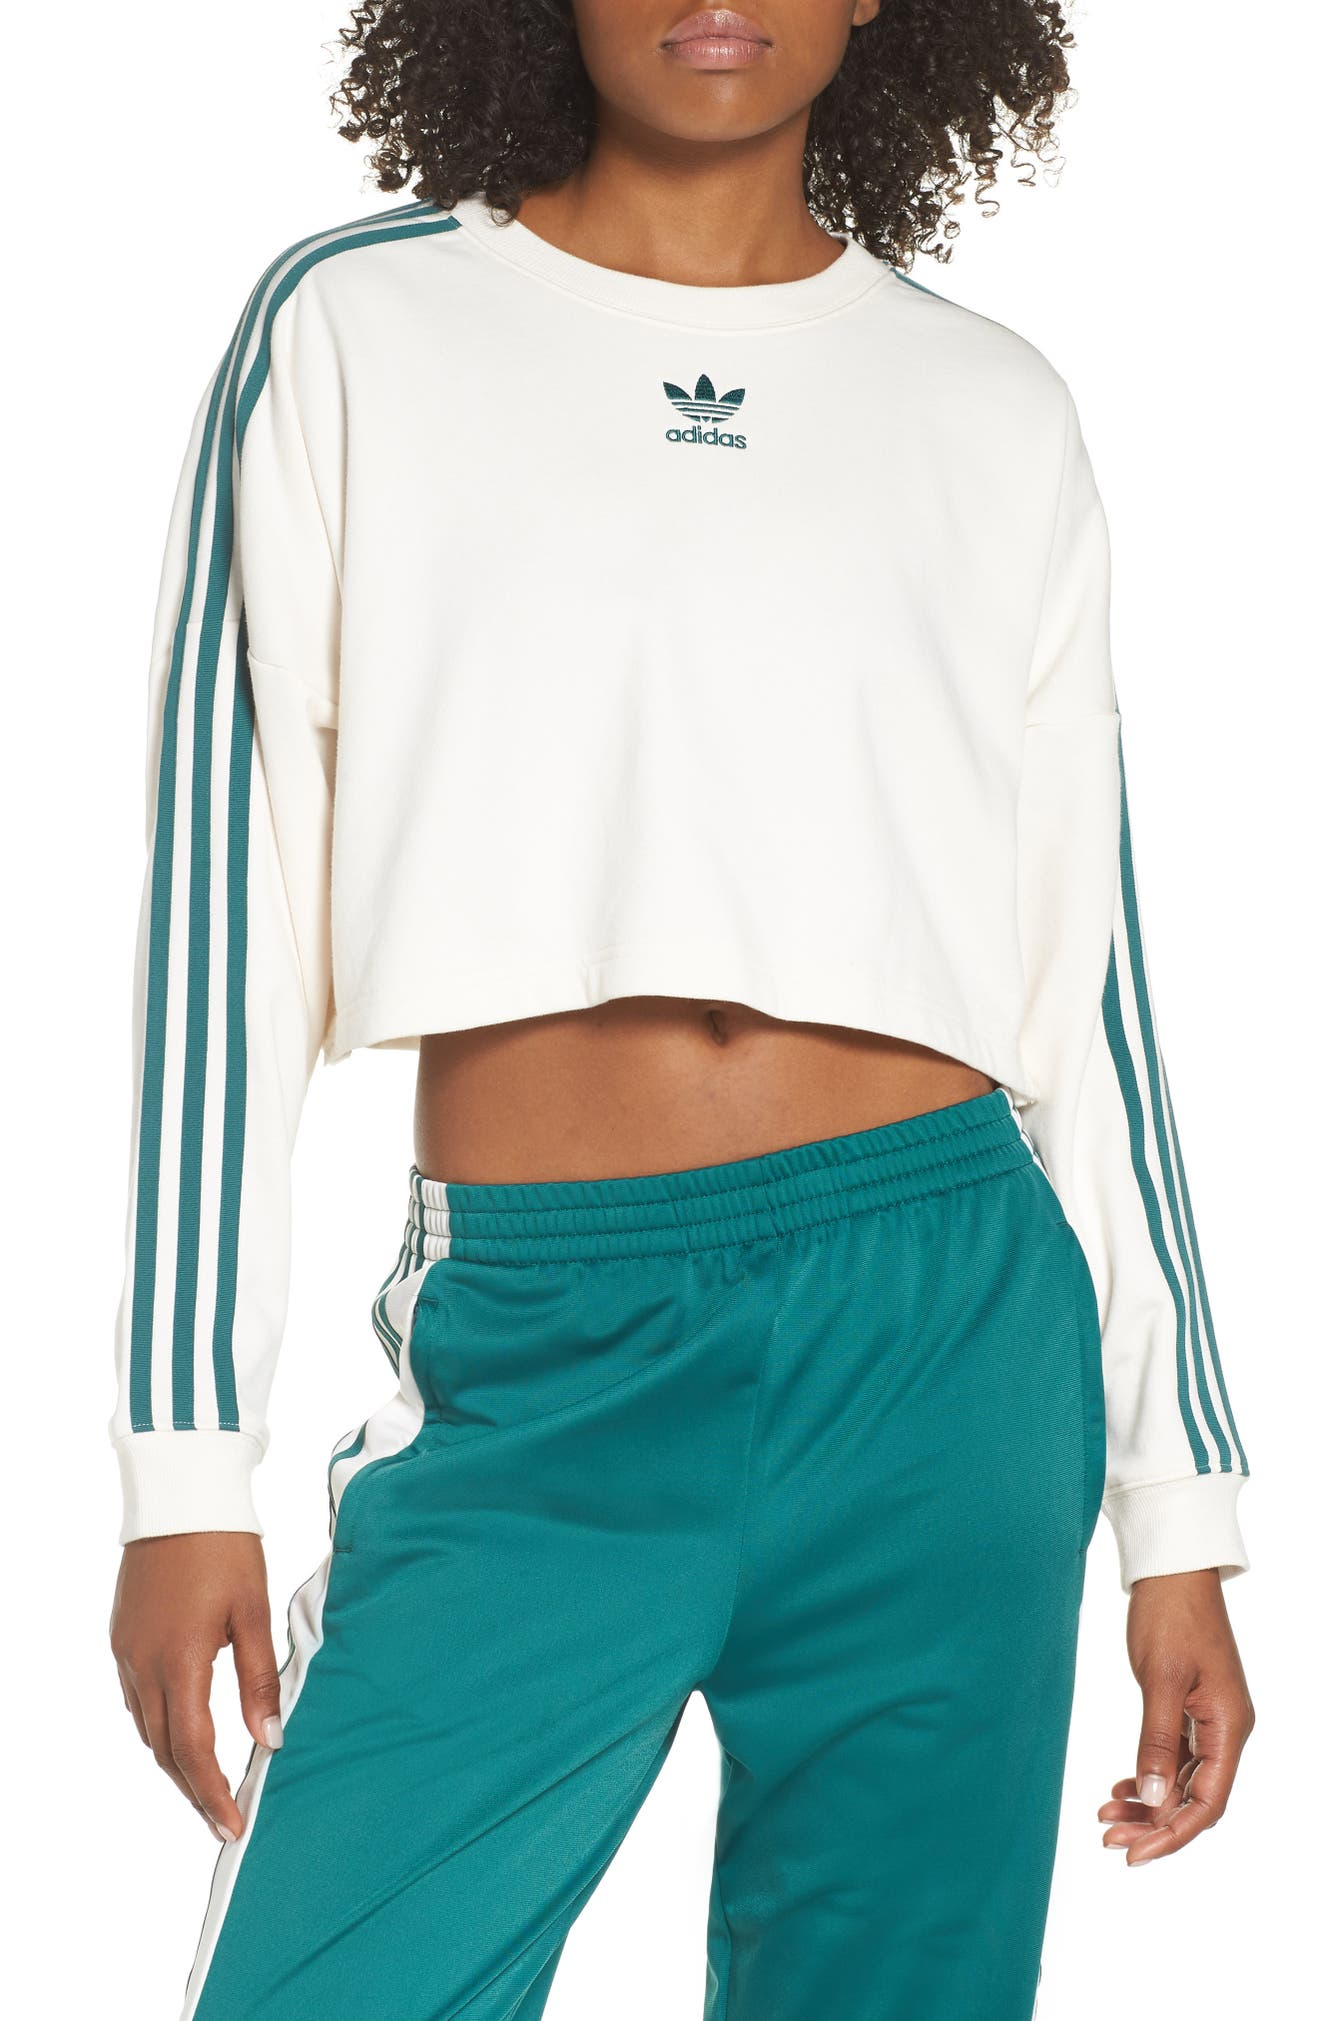 32231ac33382 adidas originals adibreak cropped sweatshirt